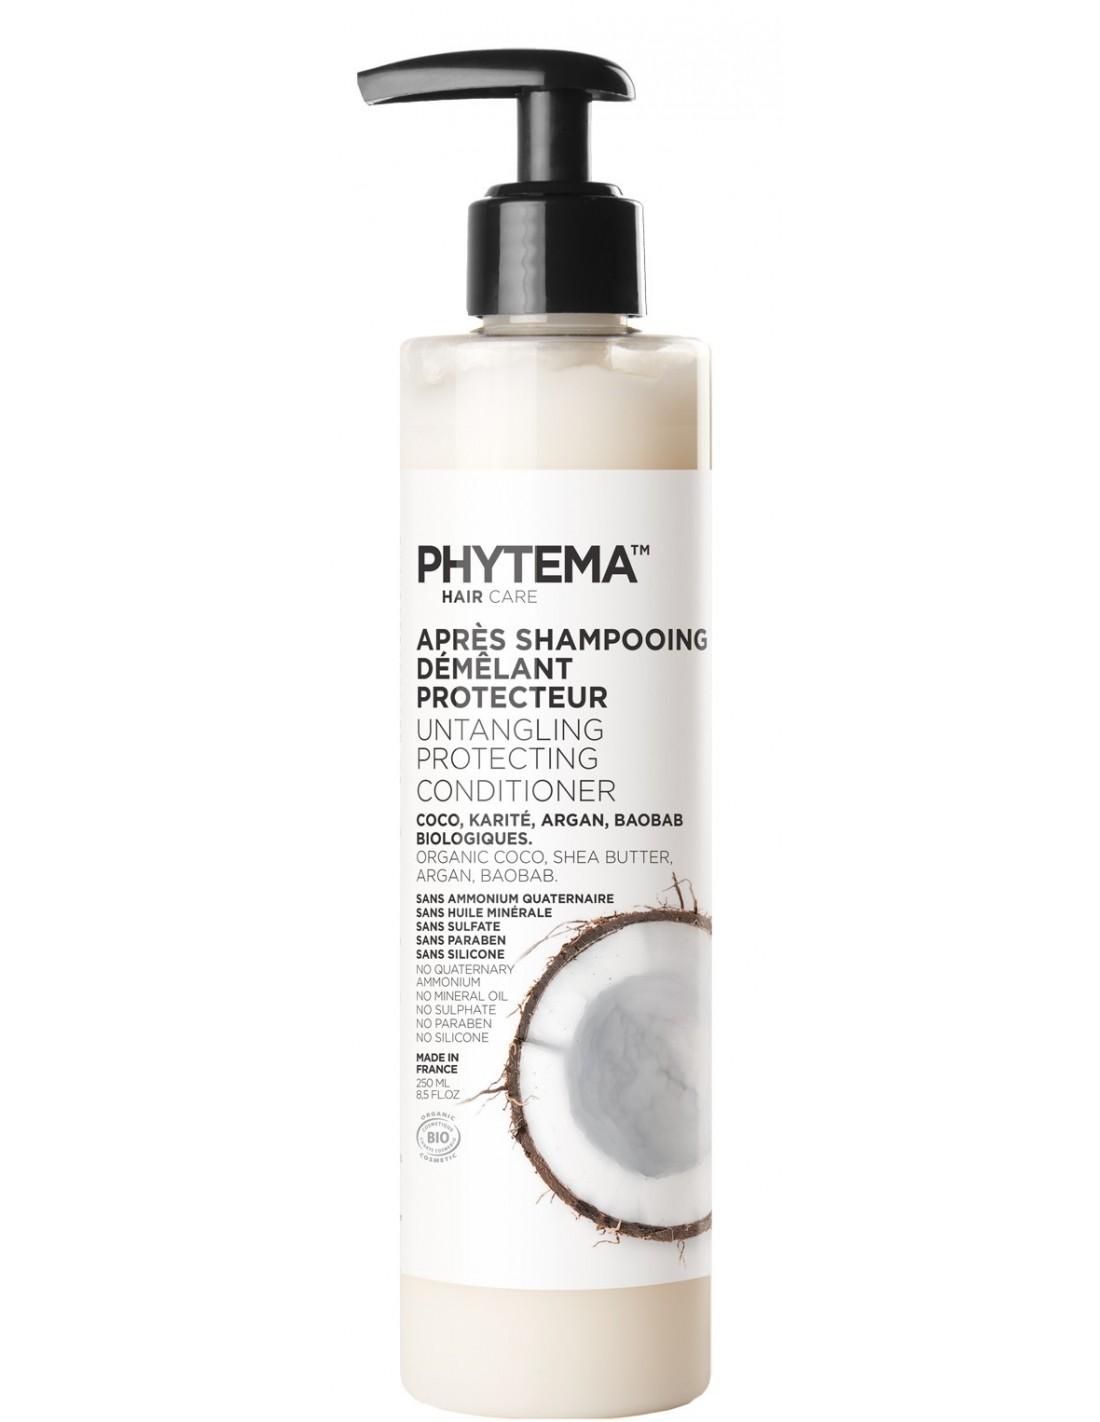 Phytema Après Shampoing Démêlant Protecteur 250 ML 3760054010062